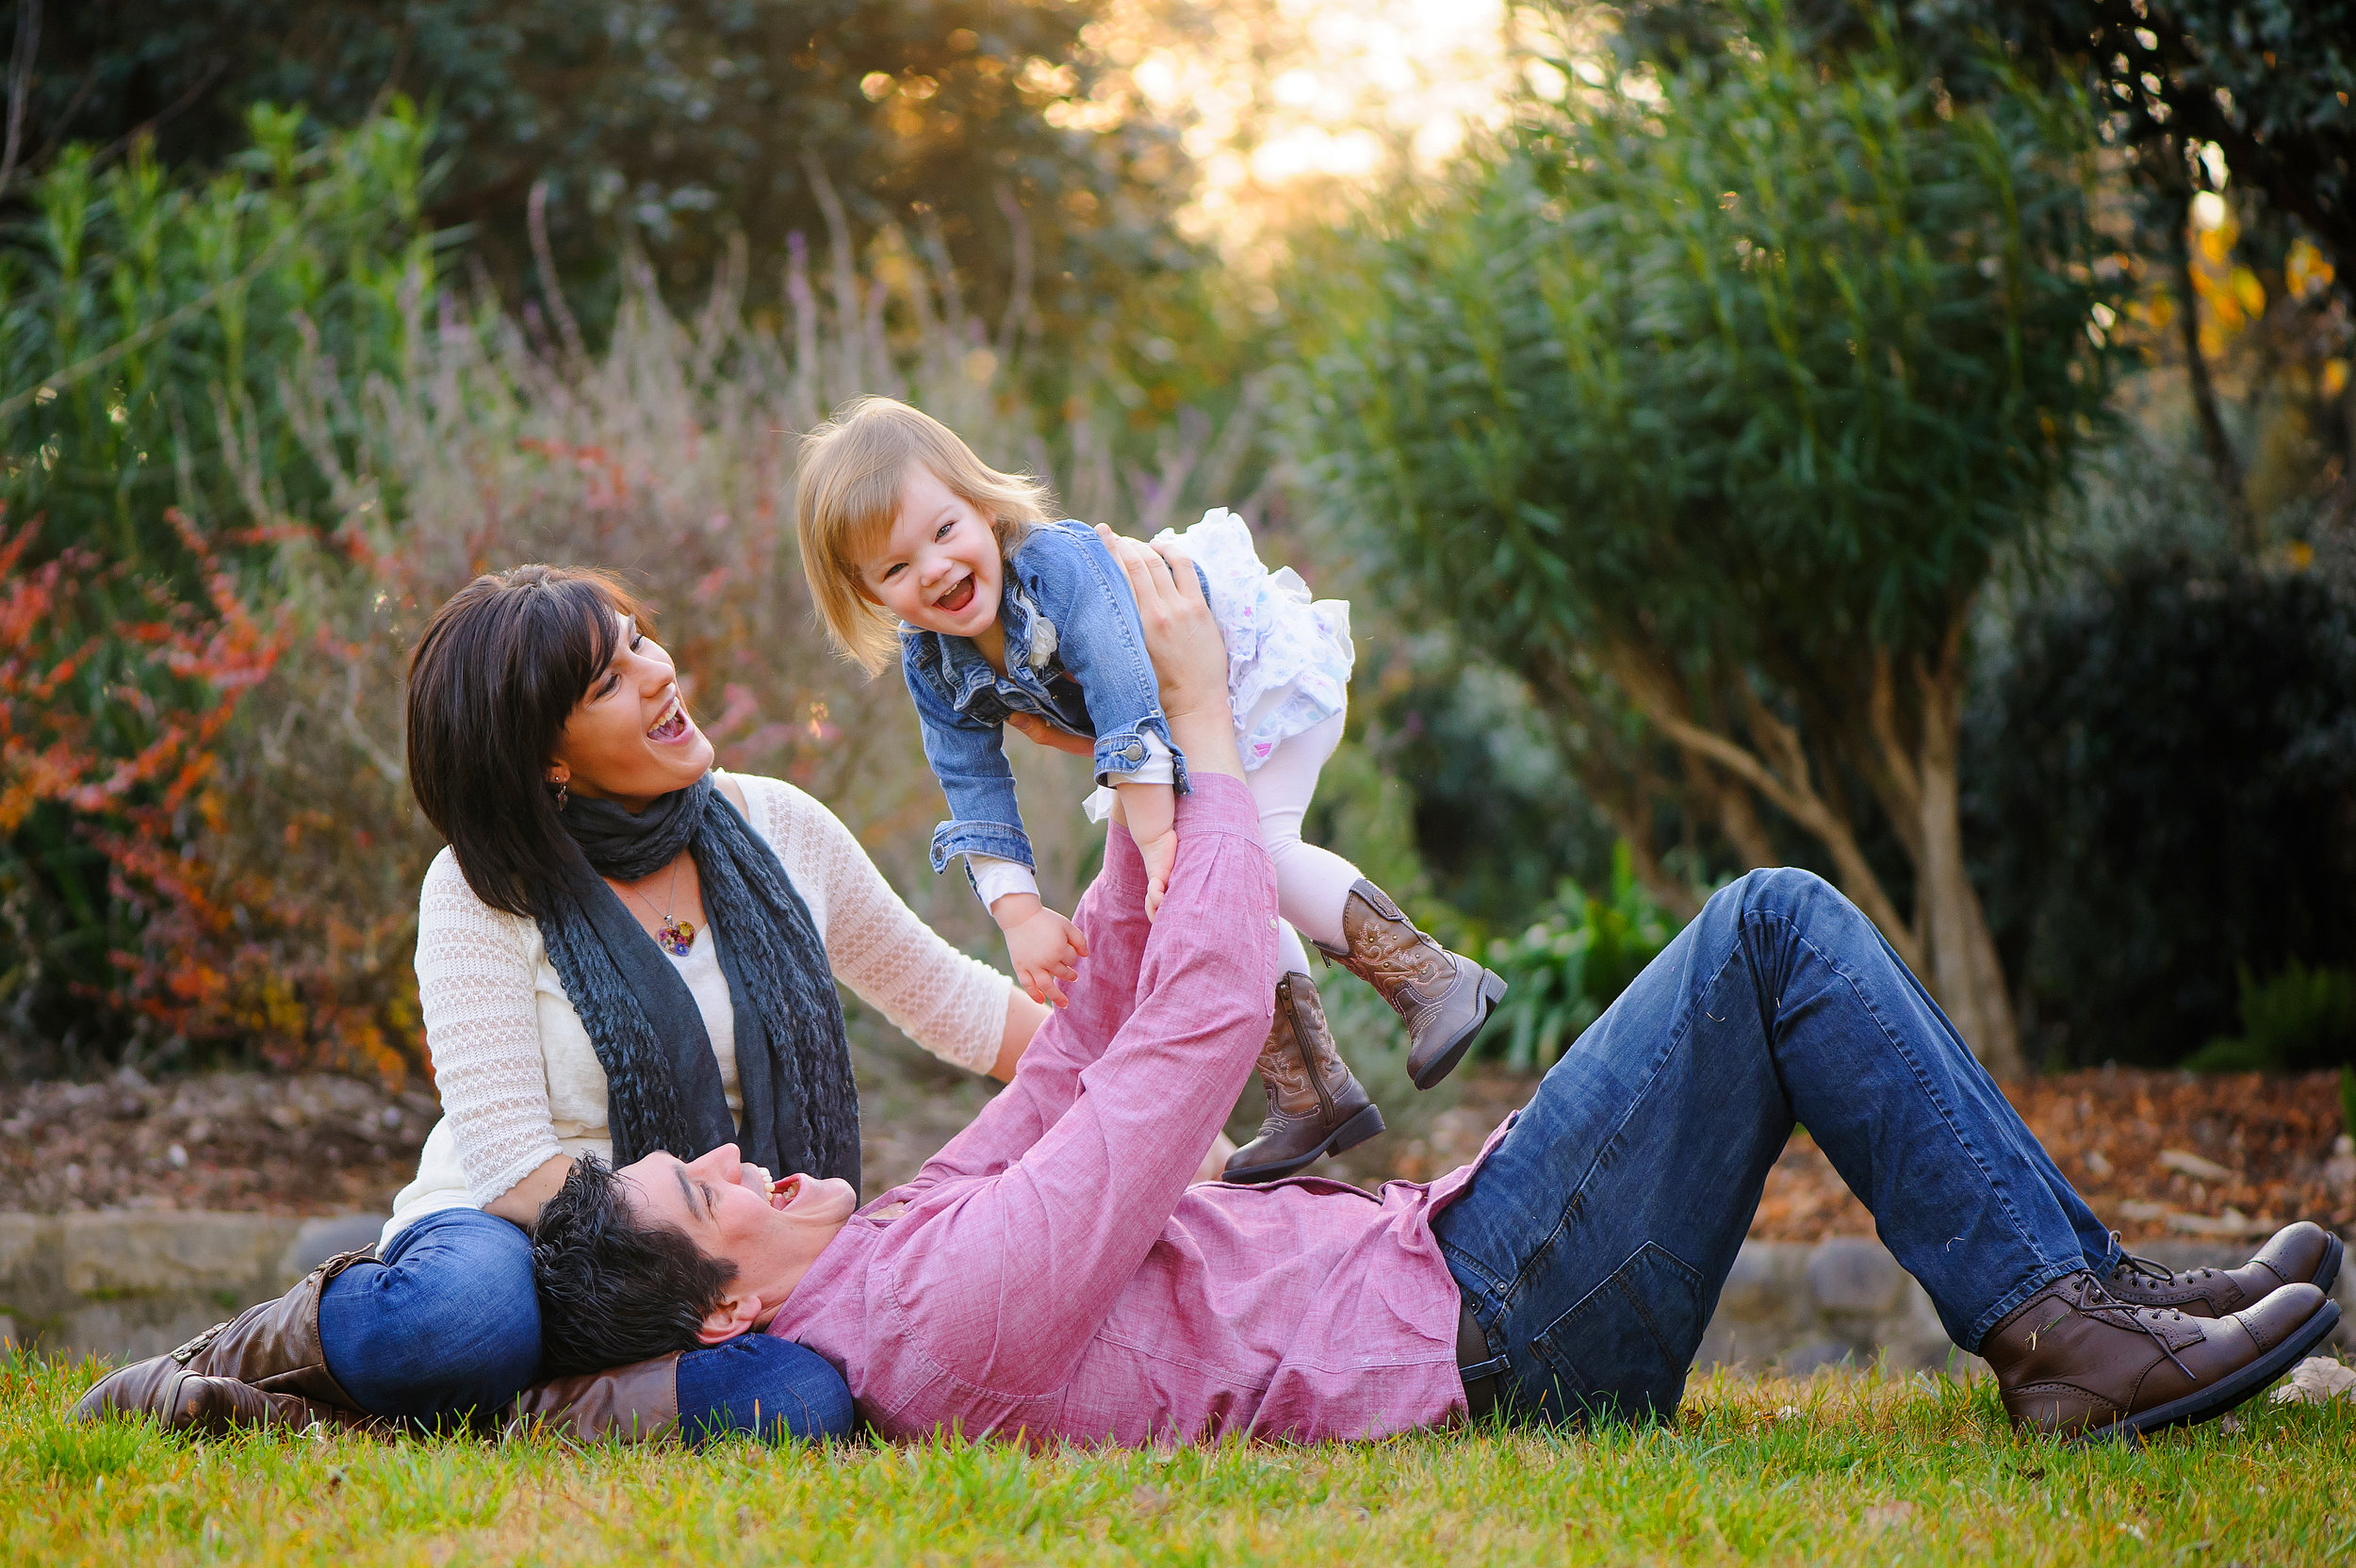 martinez-family-108-sacramento-family-photographer-katherine-nicole-photography.JPG